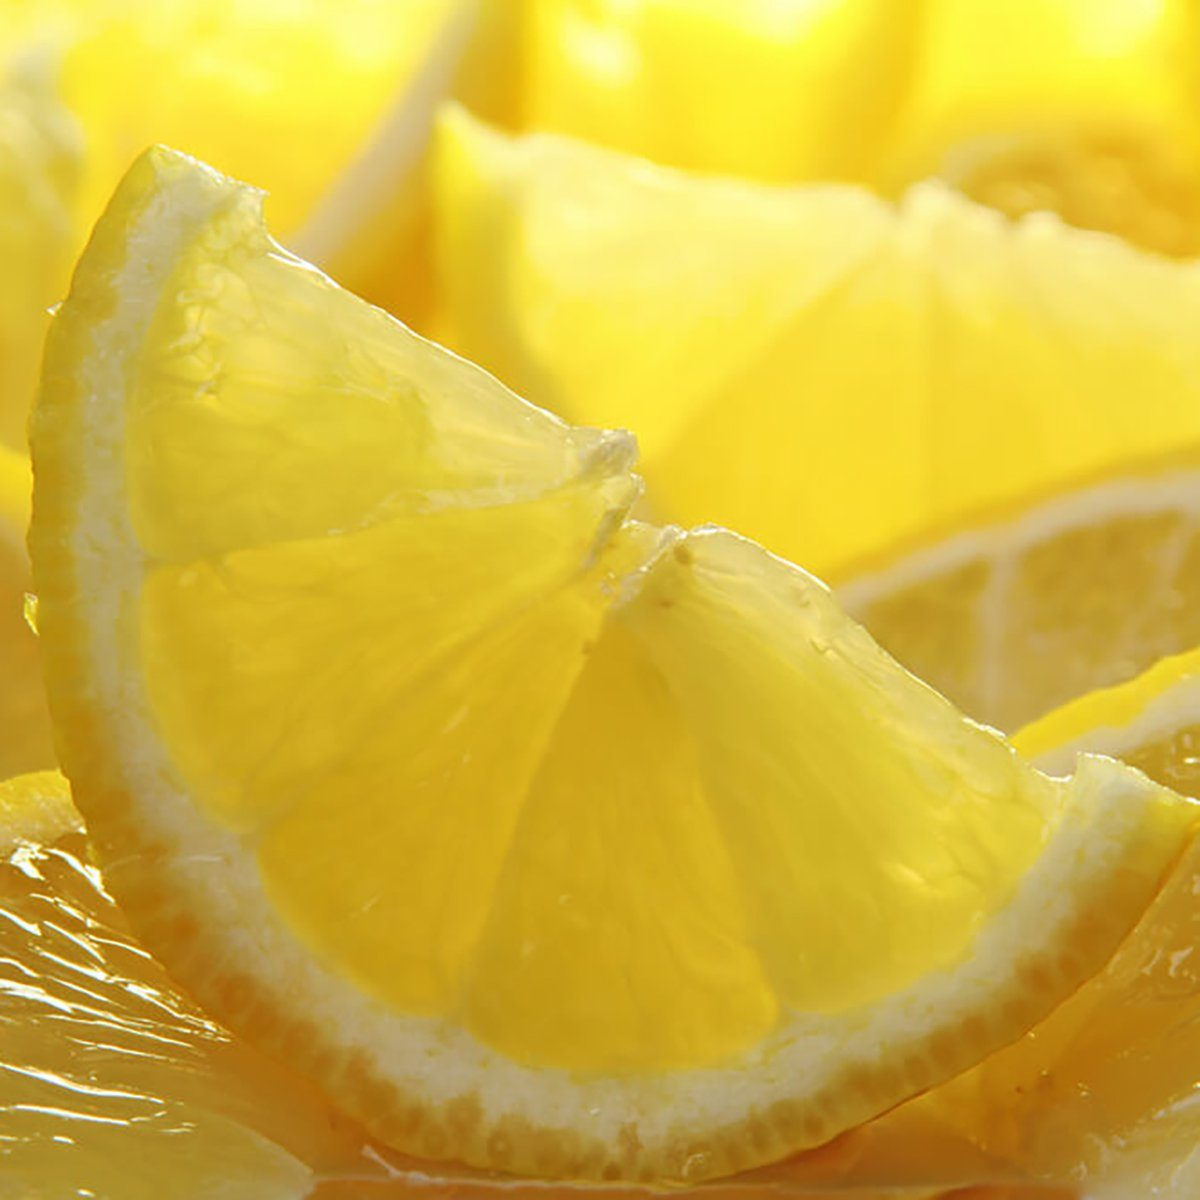 lemon wedges closeup